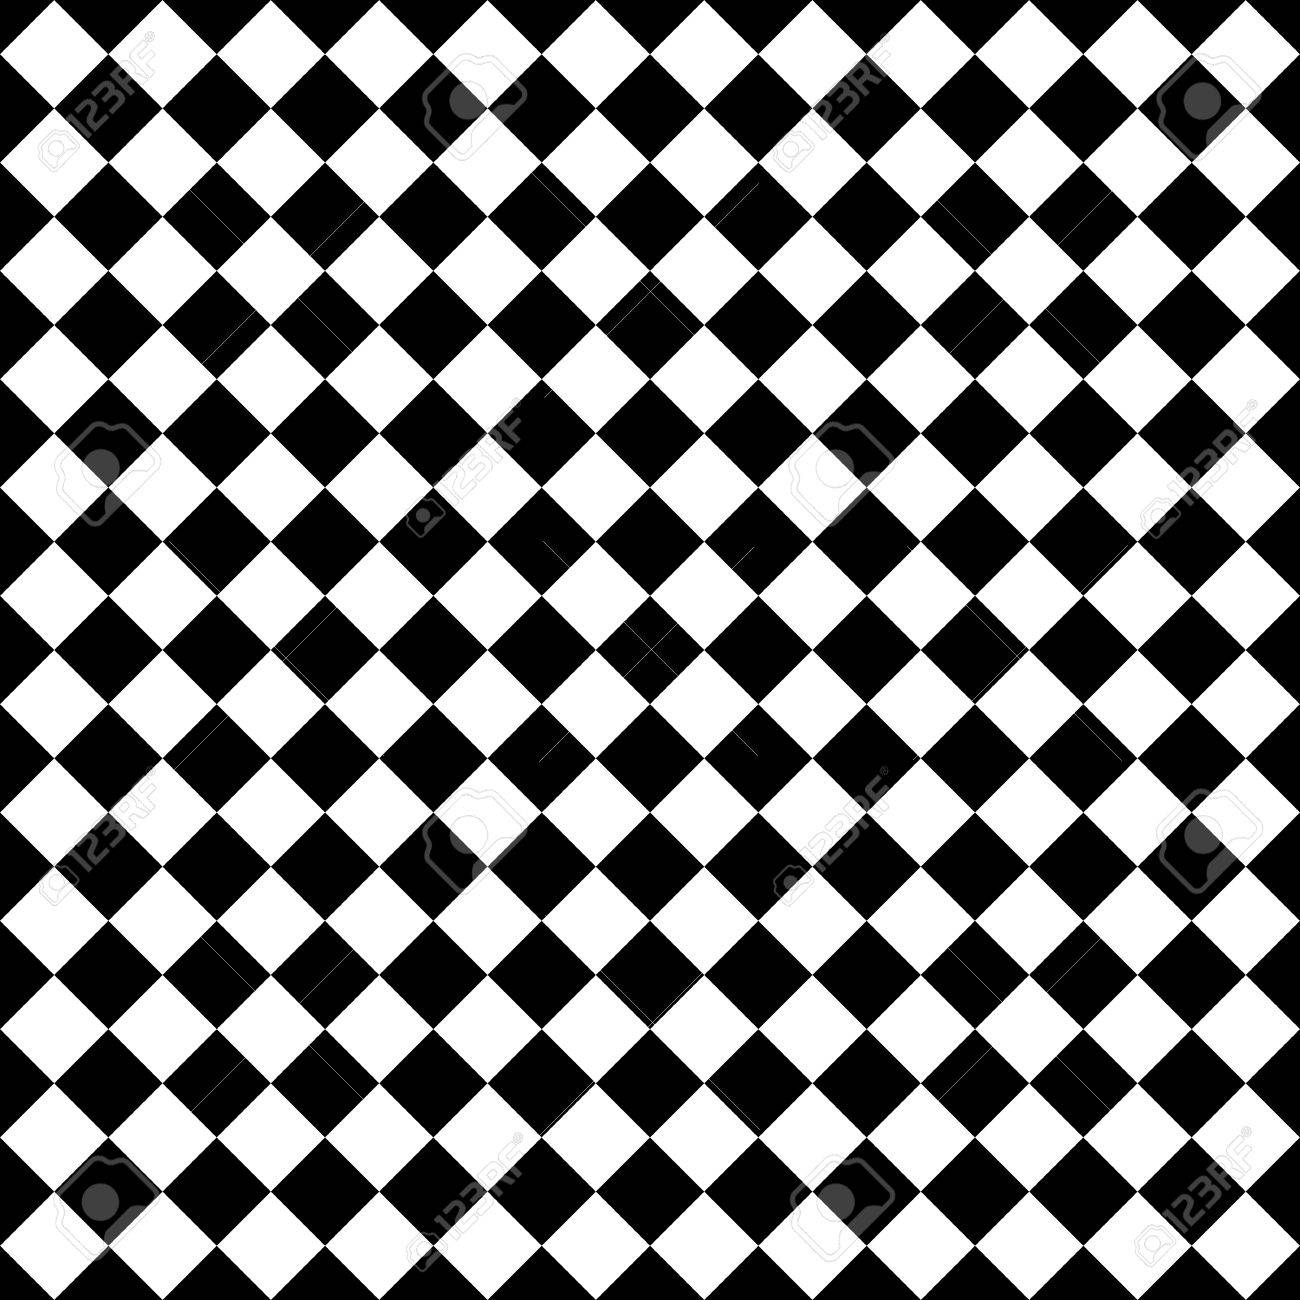 Patchworkstoff Harmony Comic Muster Kringel Schwarz Weiss